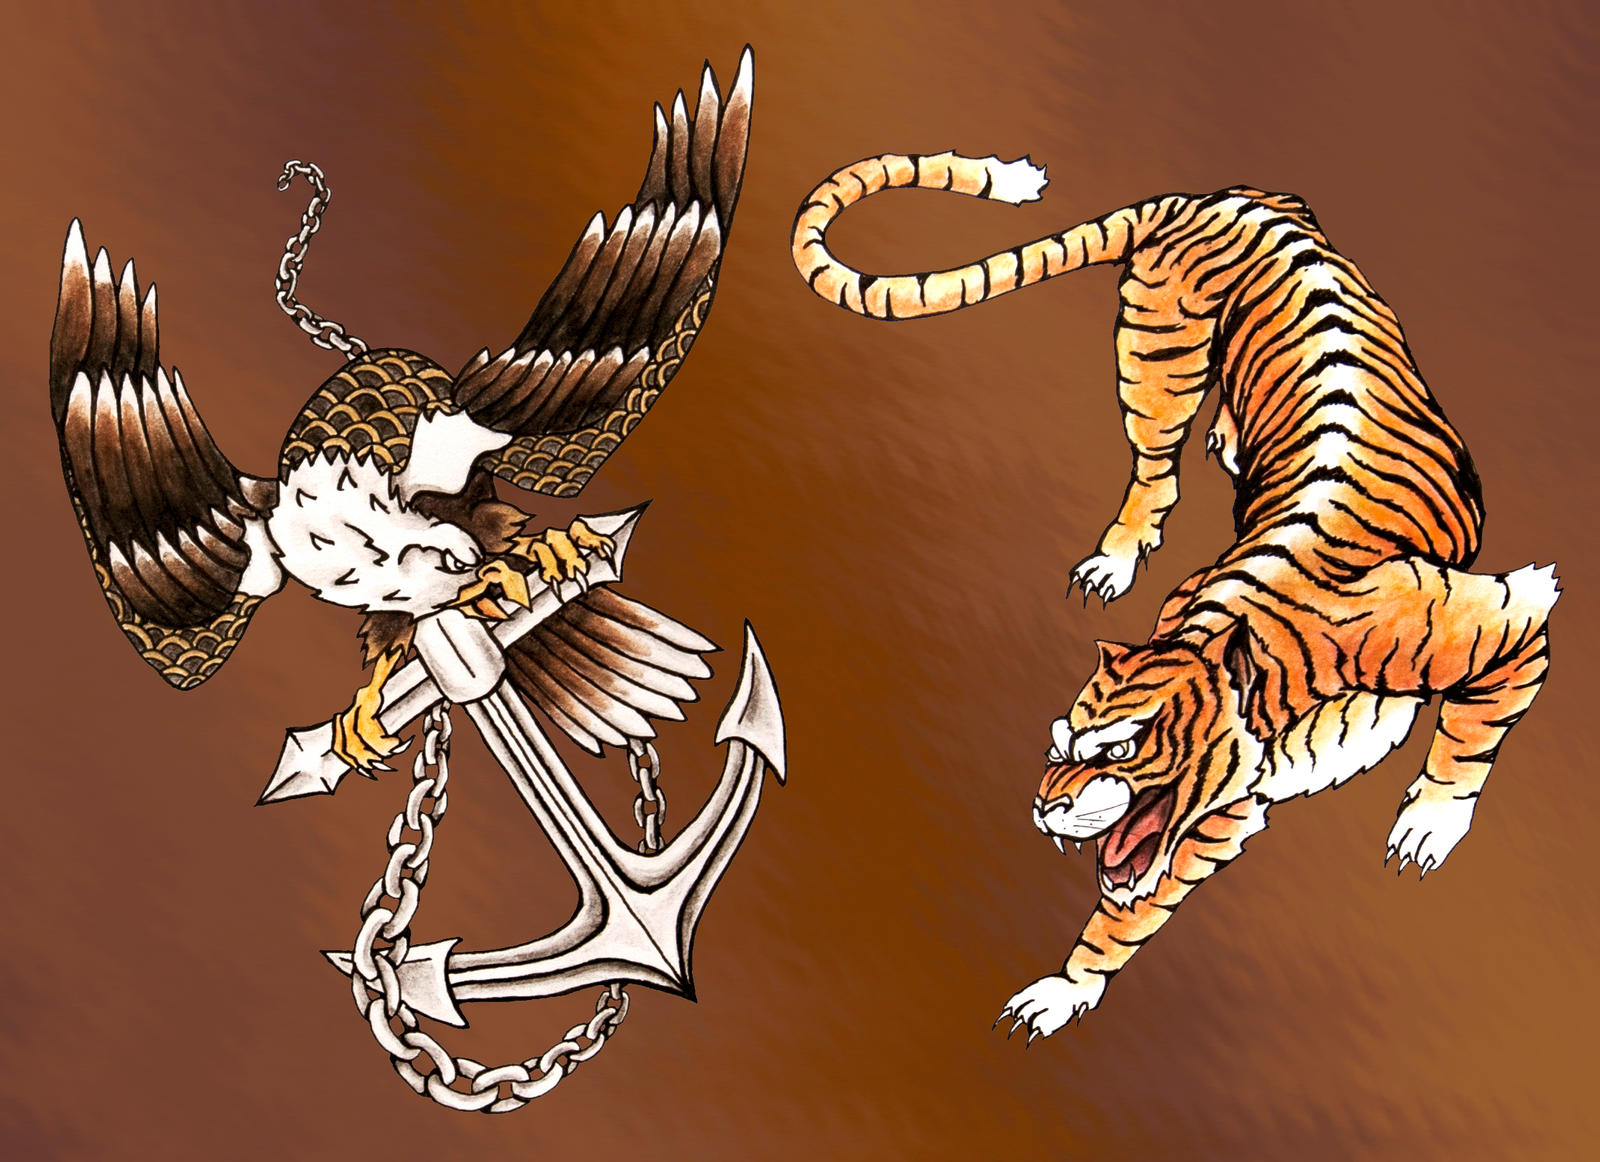 tigers vs warriors - HD1600×1162